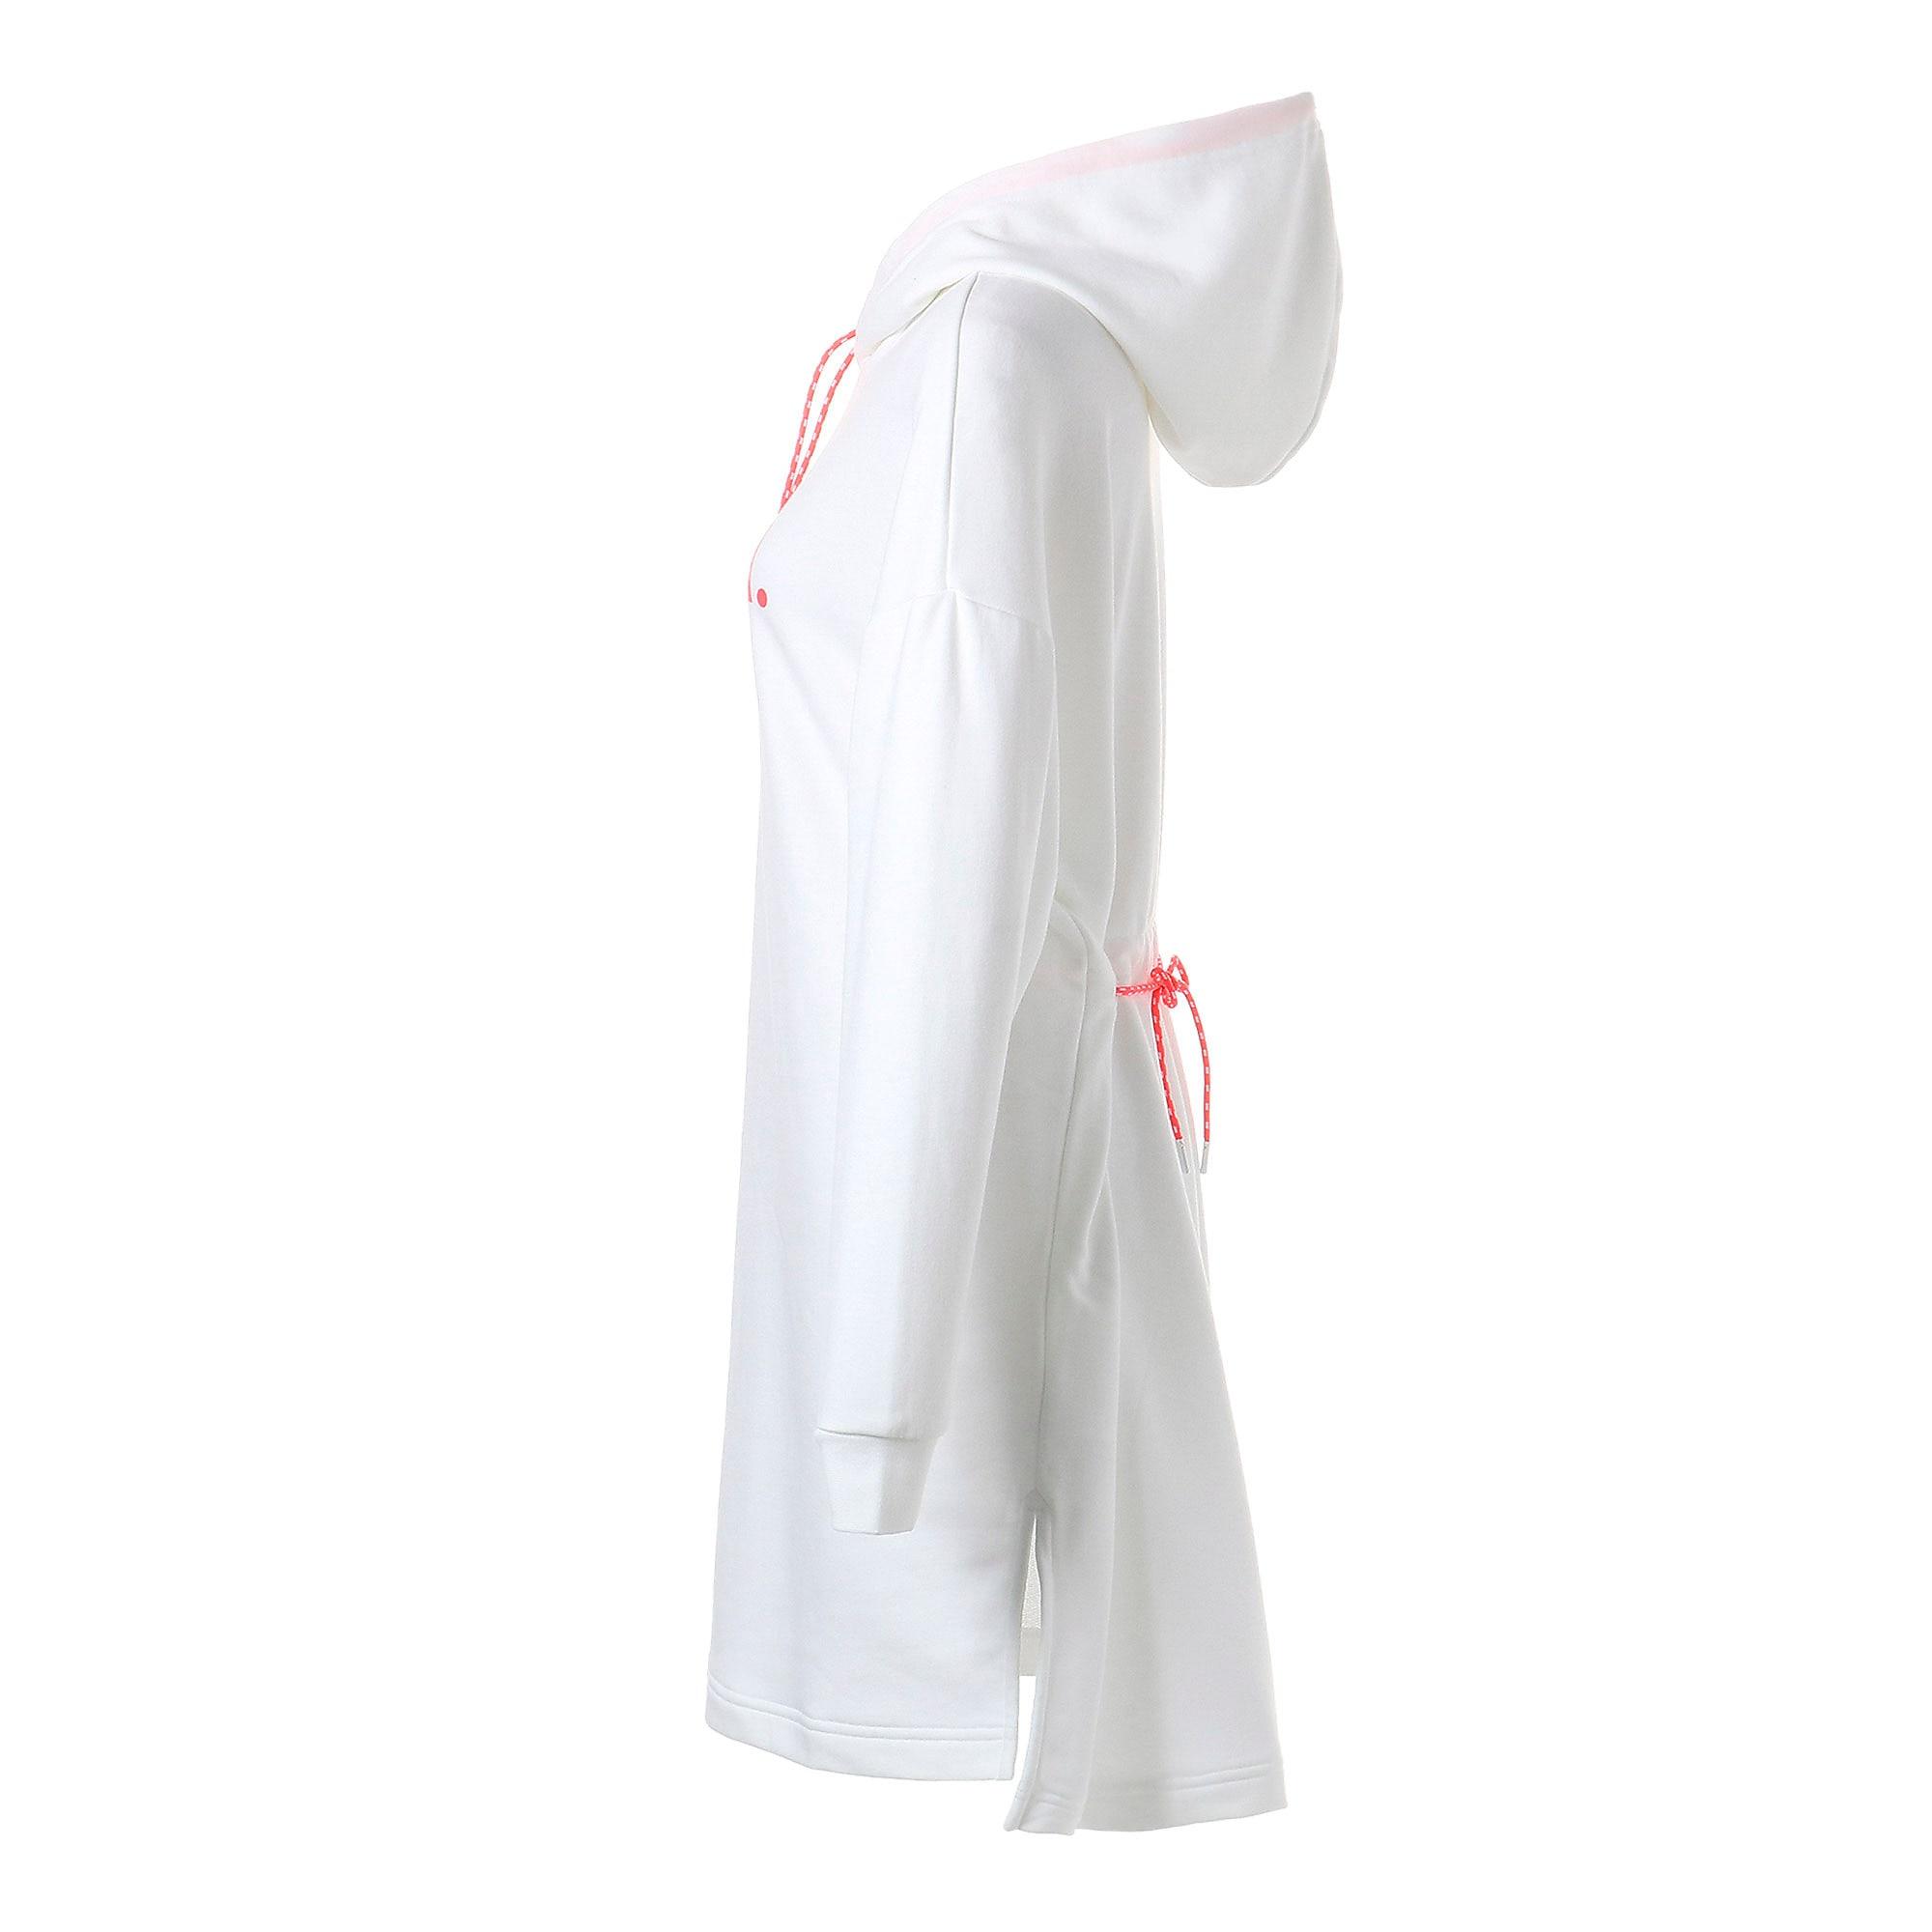 Thumbnail 5 of CHASE ウィメンズ フーデッドドレス, Puma White, medium-JPN